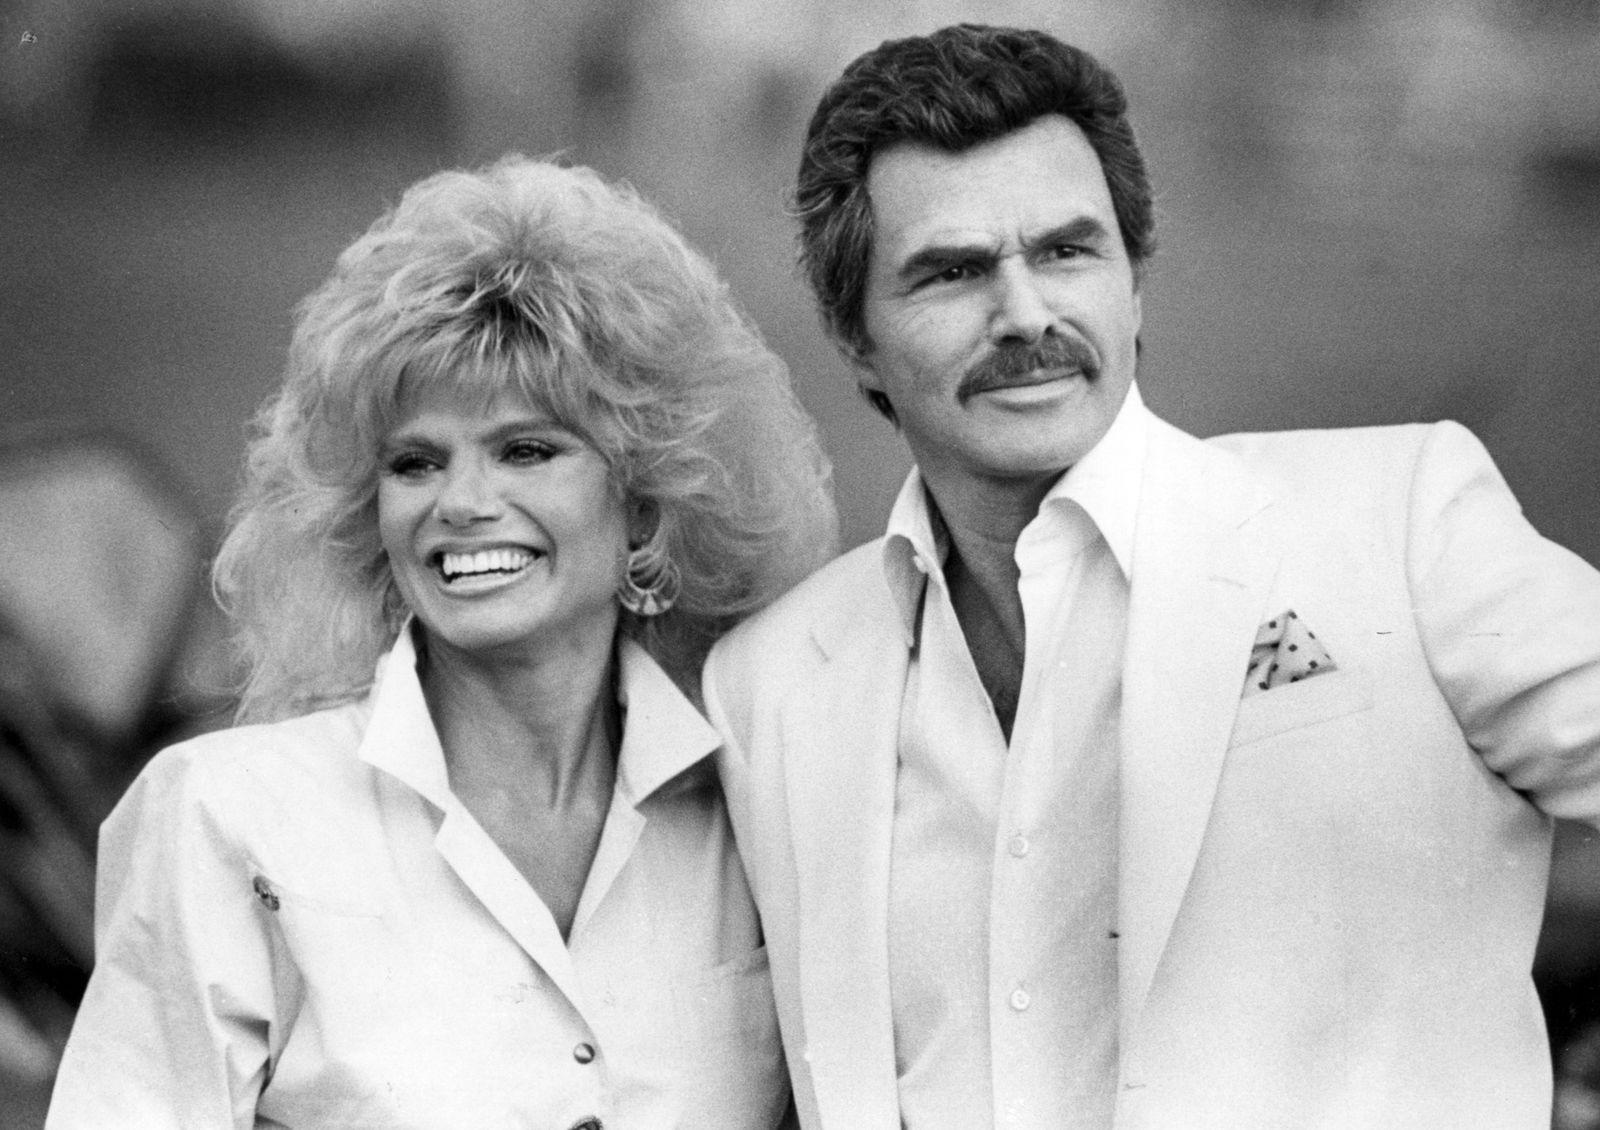 Burt Reynolds Loni Anderson